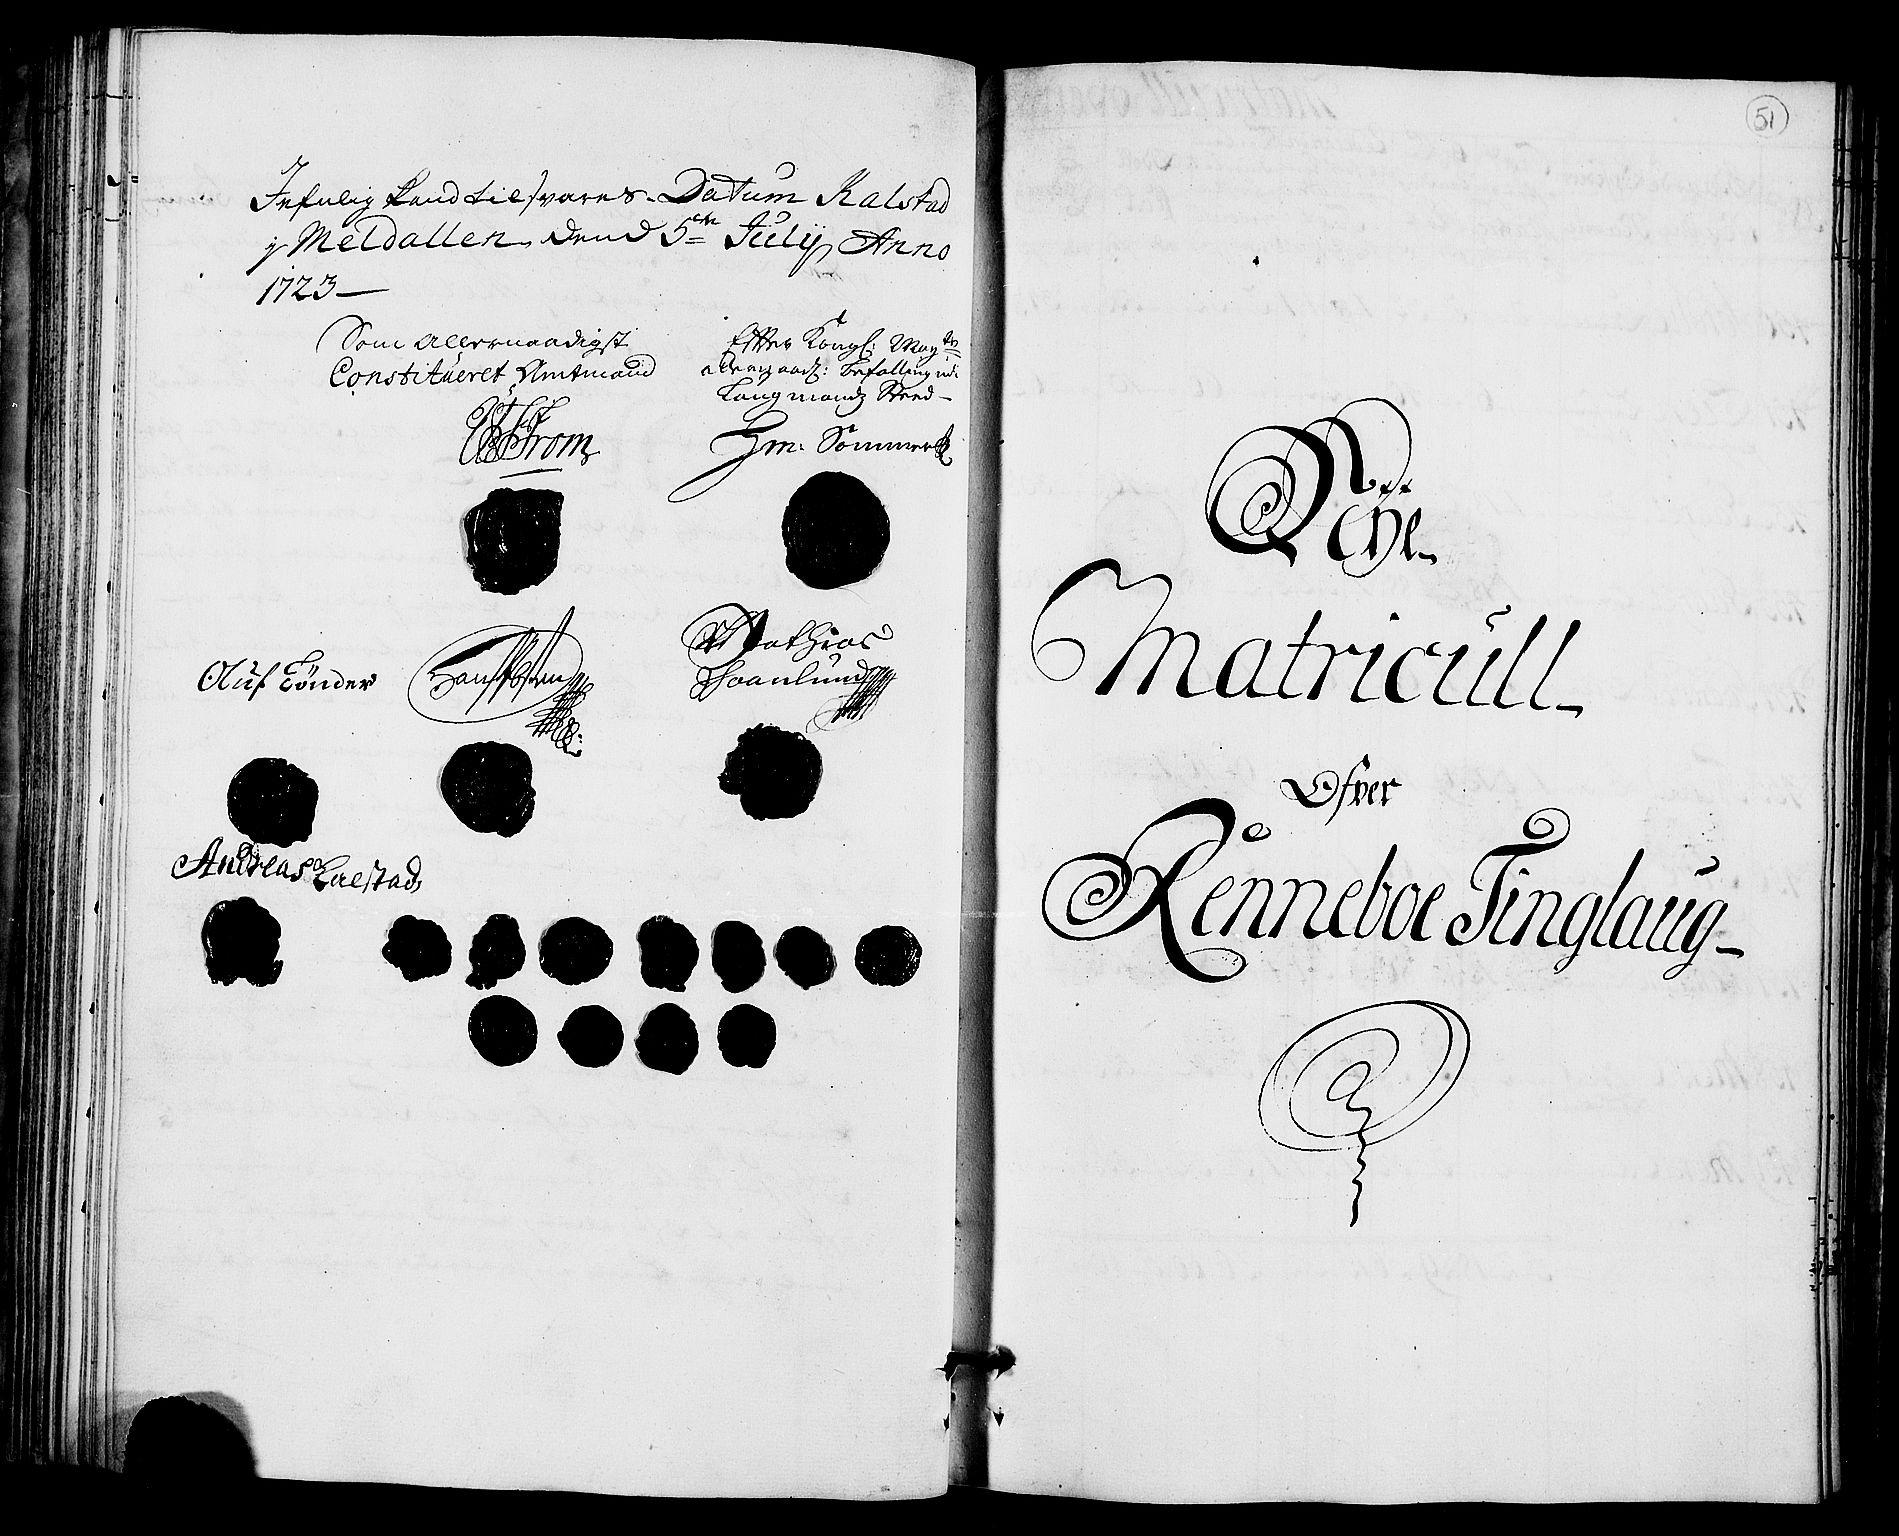 RA, Rentekammeret inntil 1814, Realistisk ordnet avdeling, N/Nb/Nbf/L0157: Orkdal matrikkelprotokoll, 1723, s. 50b-51a